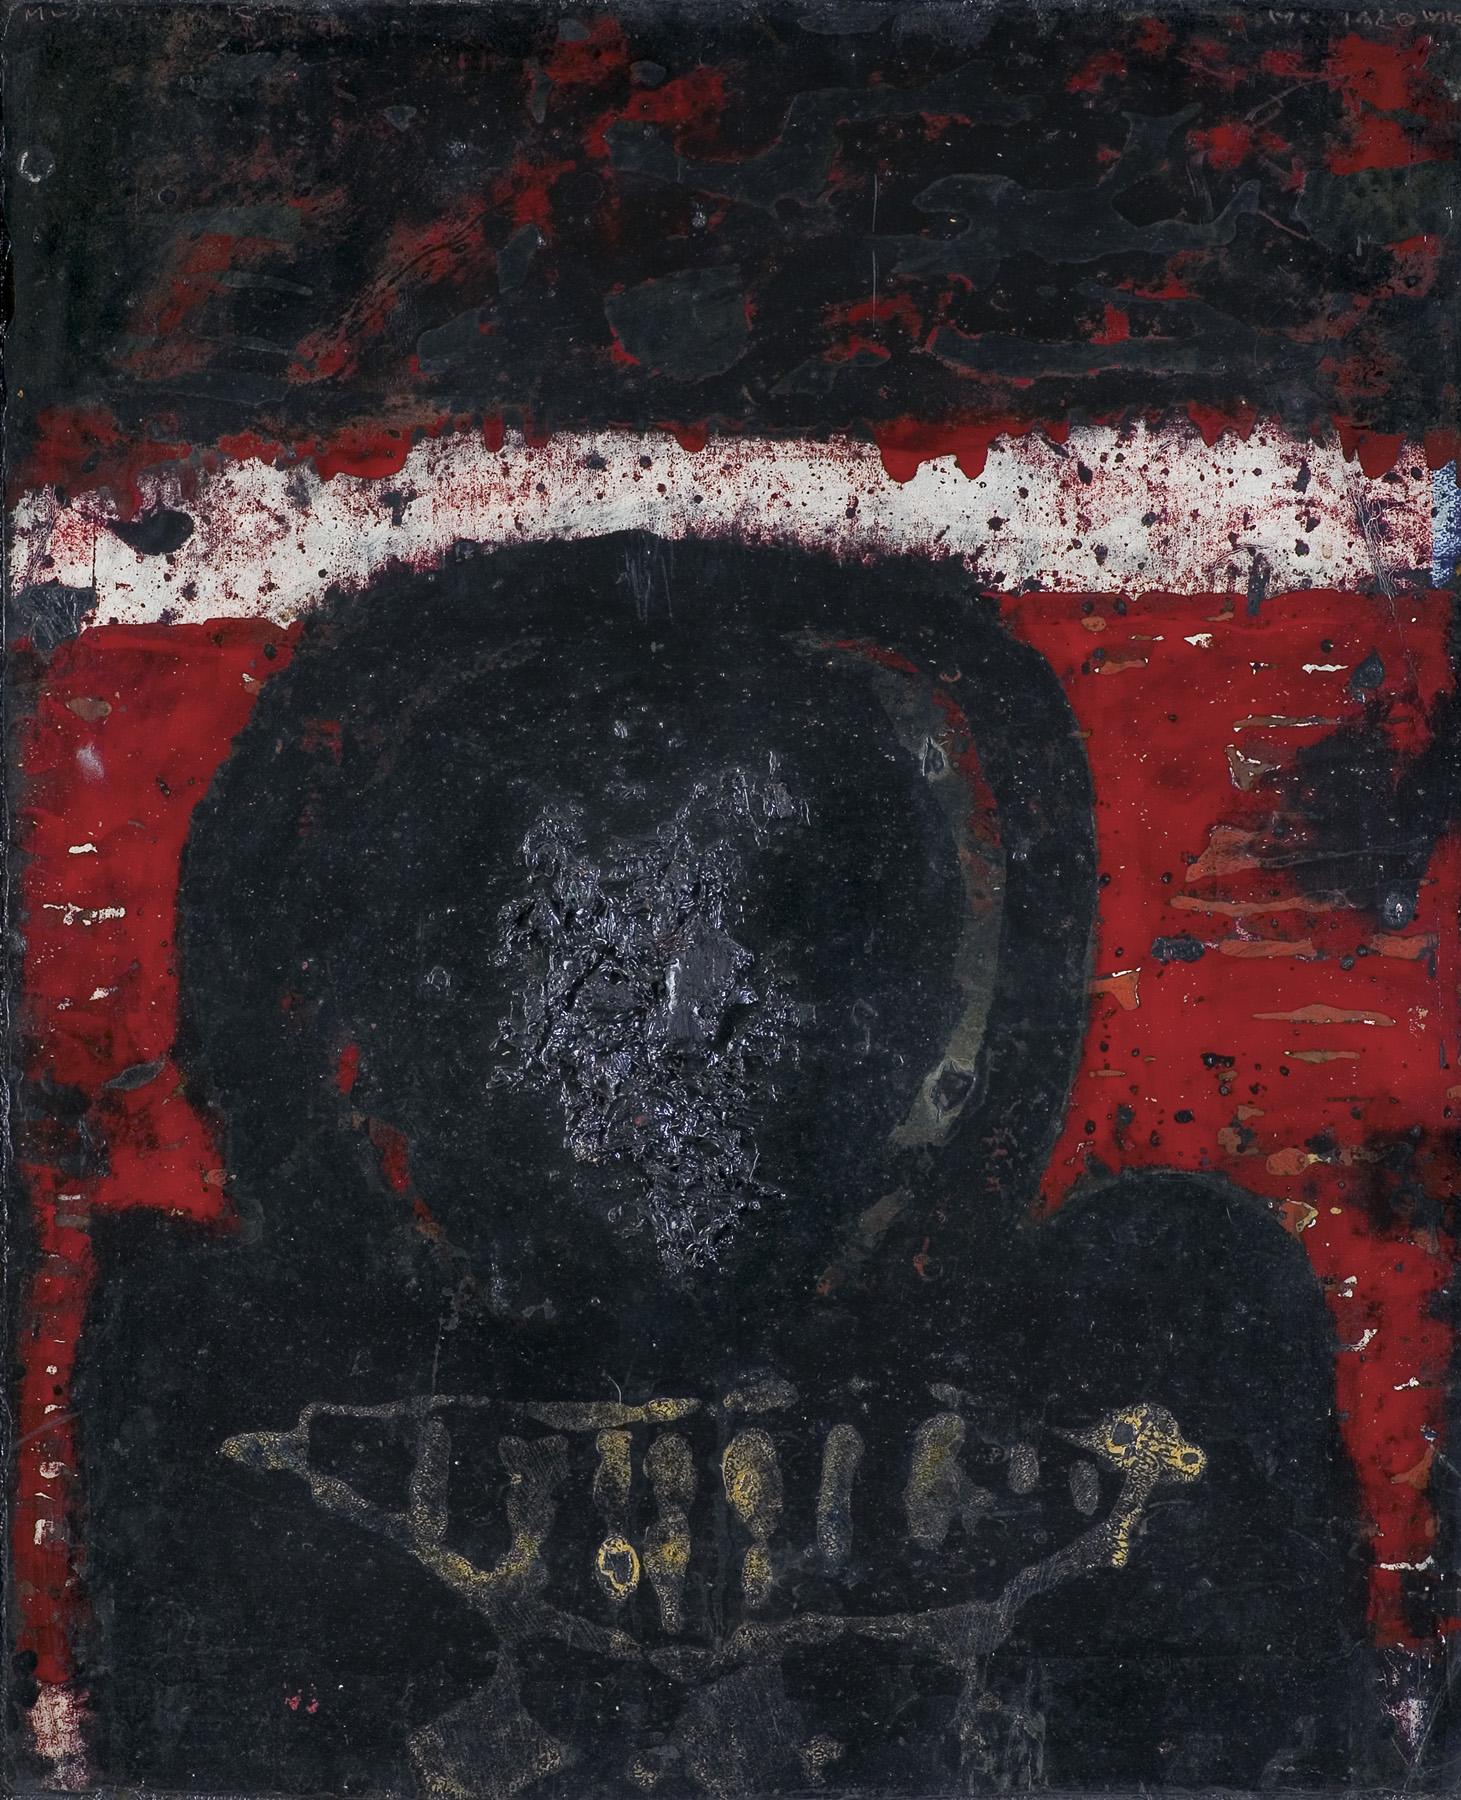 "Z CYKLU ""REMINISCENCJE"", 1976"